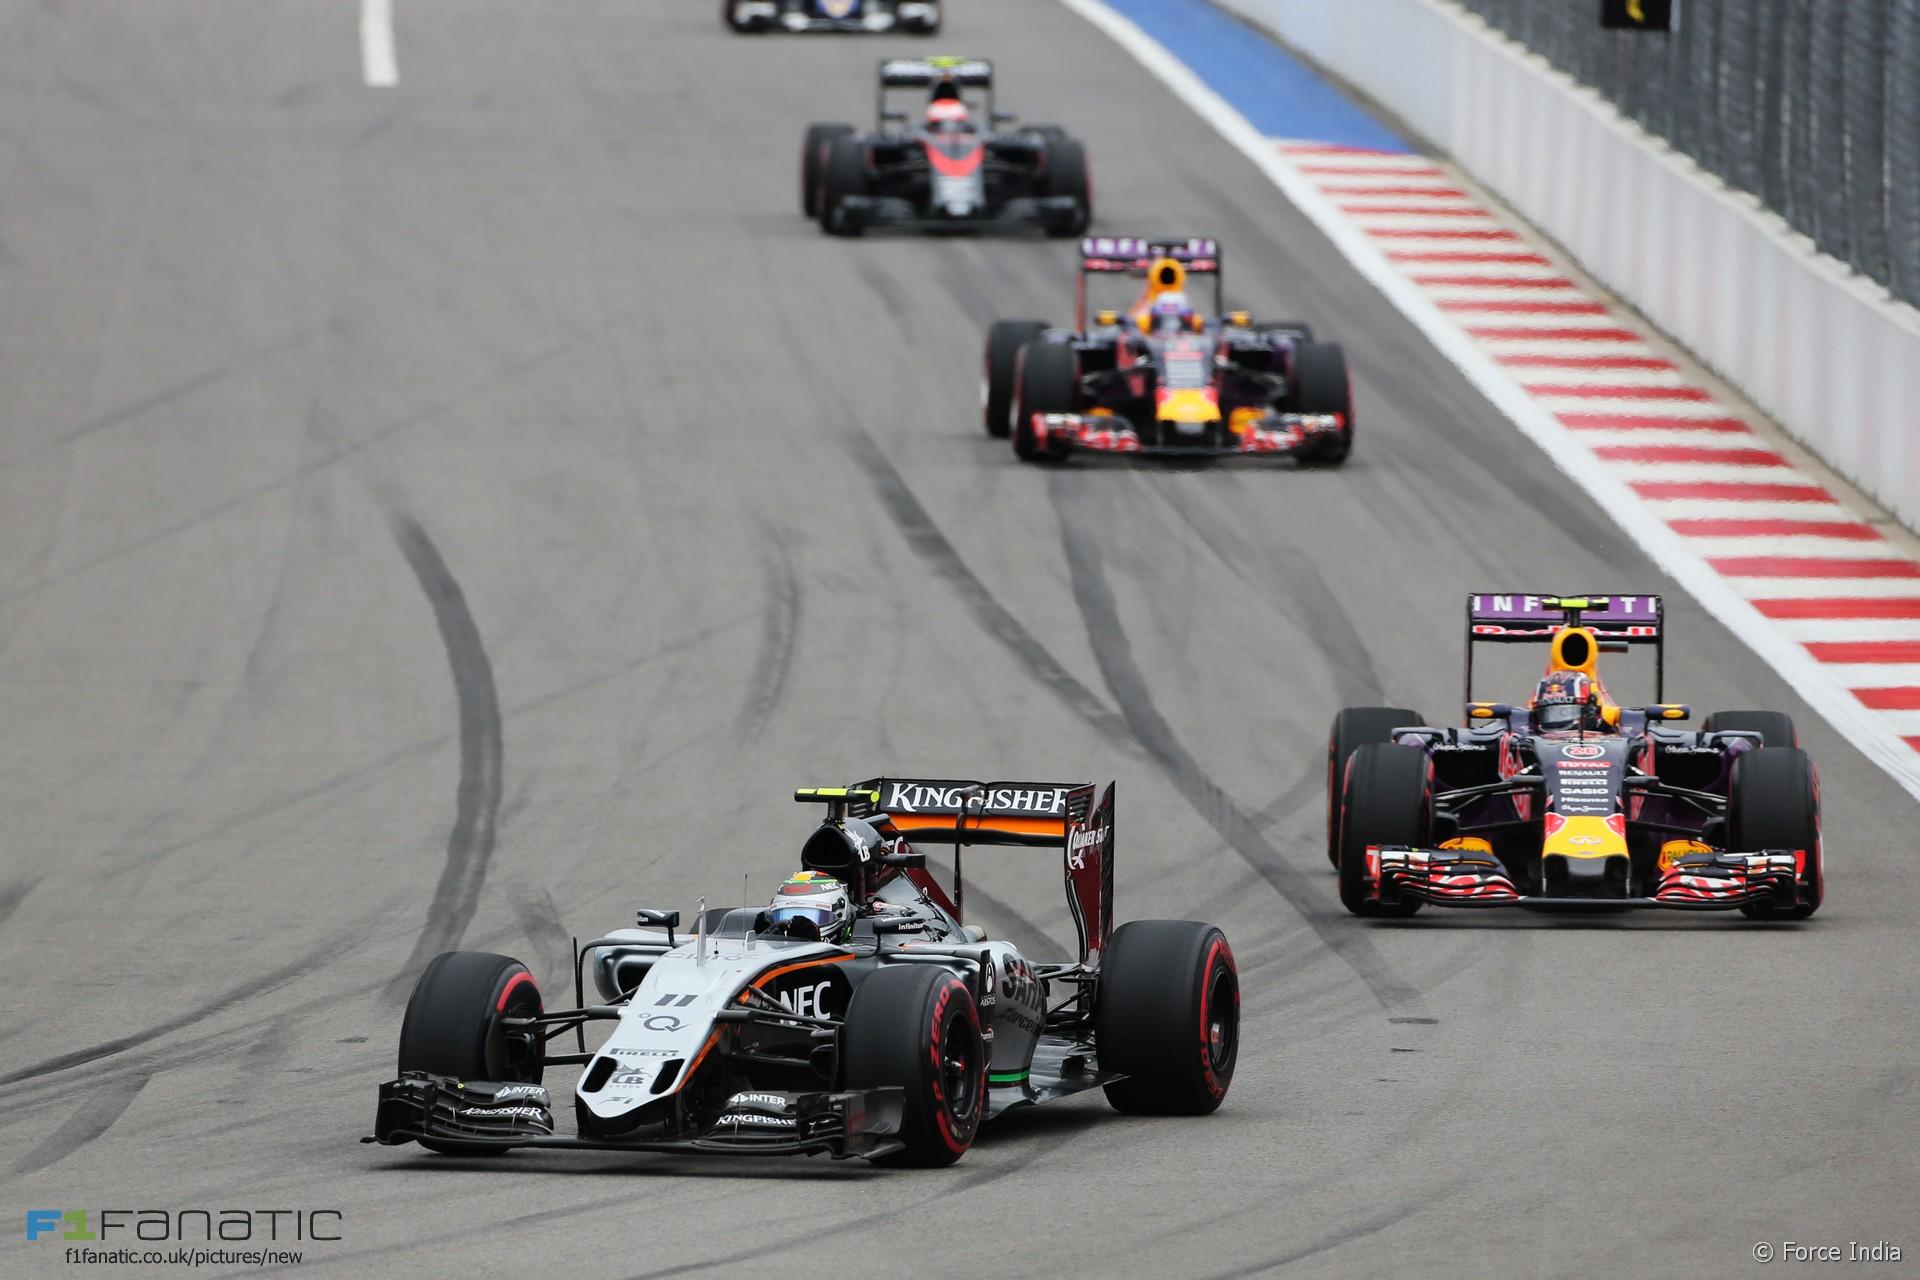 Sergio Perez, Force India, Sochi Autodrom, 2015